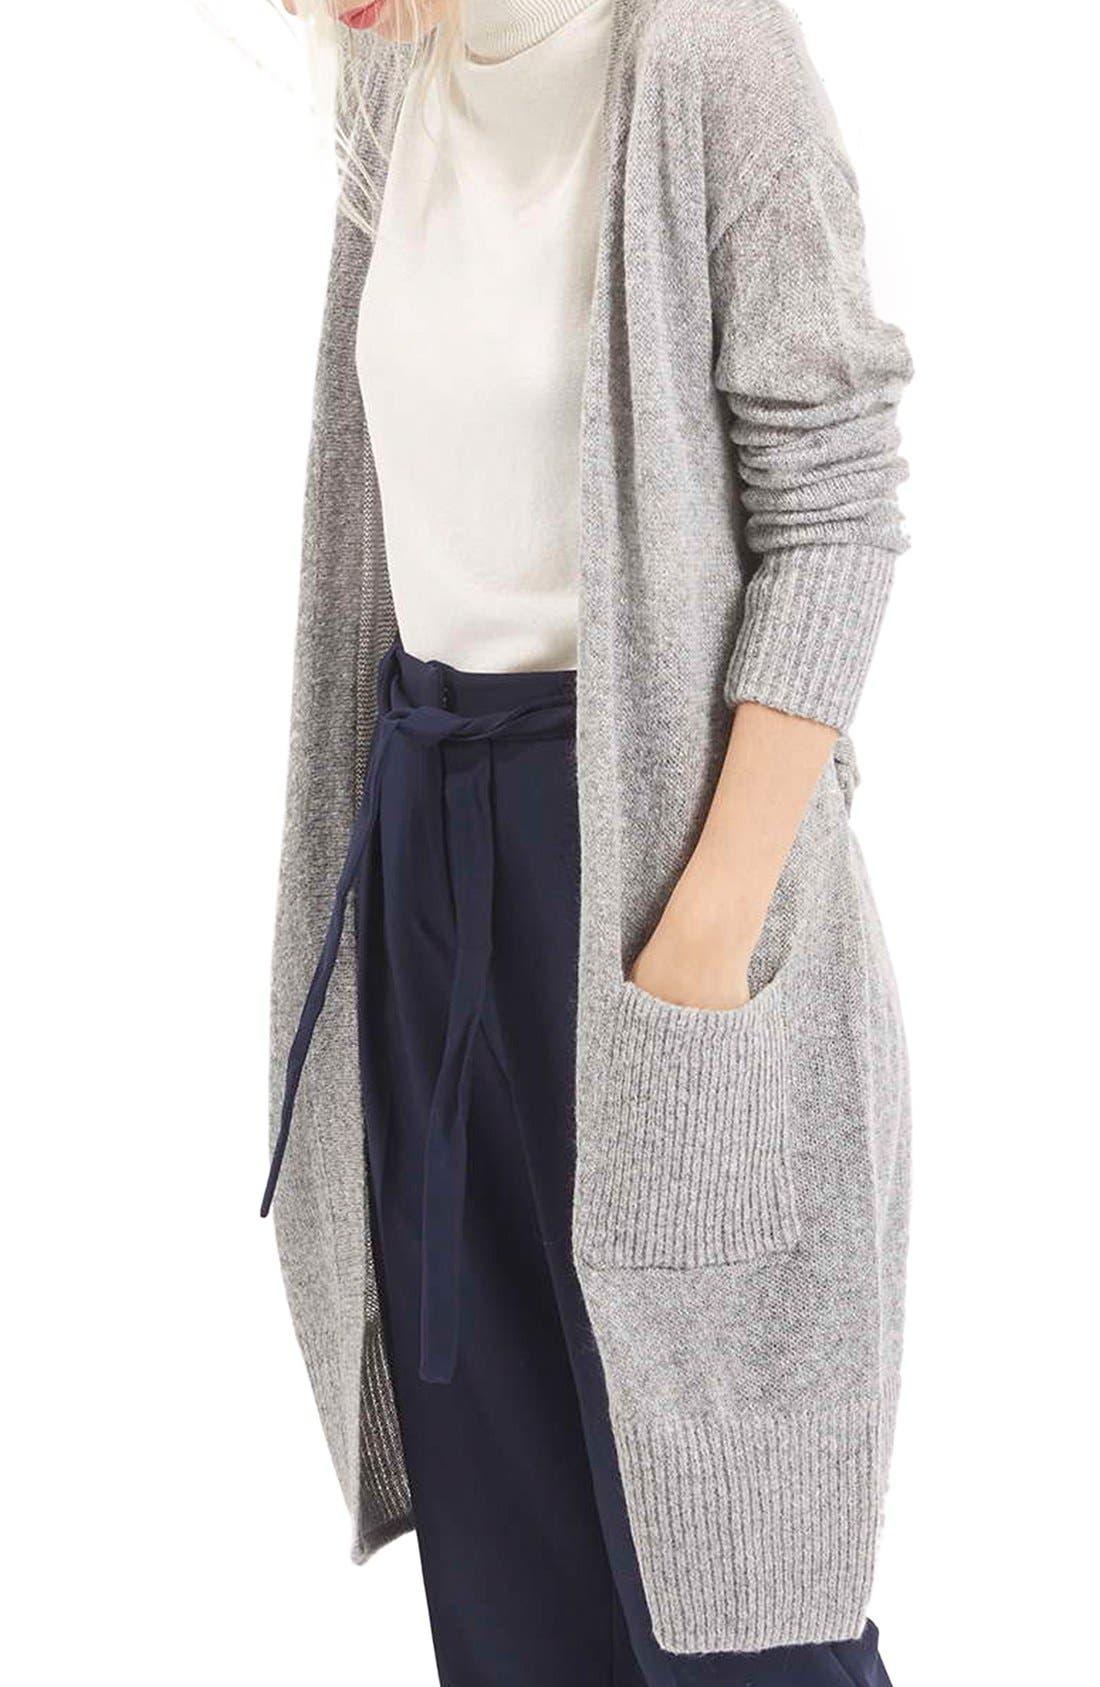 Alternate Image 1 Selected - Topshop 'Lulu' Belted Longline Cardigan